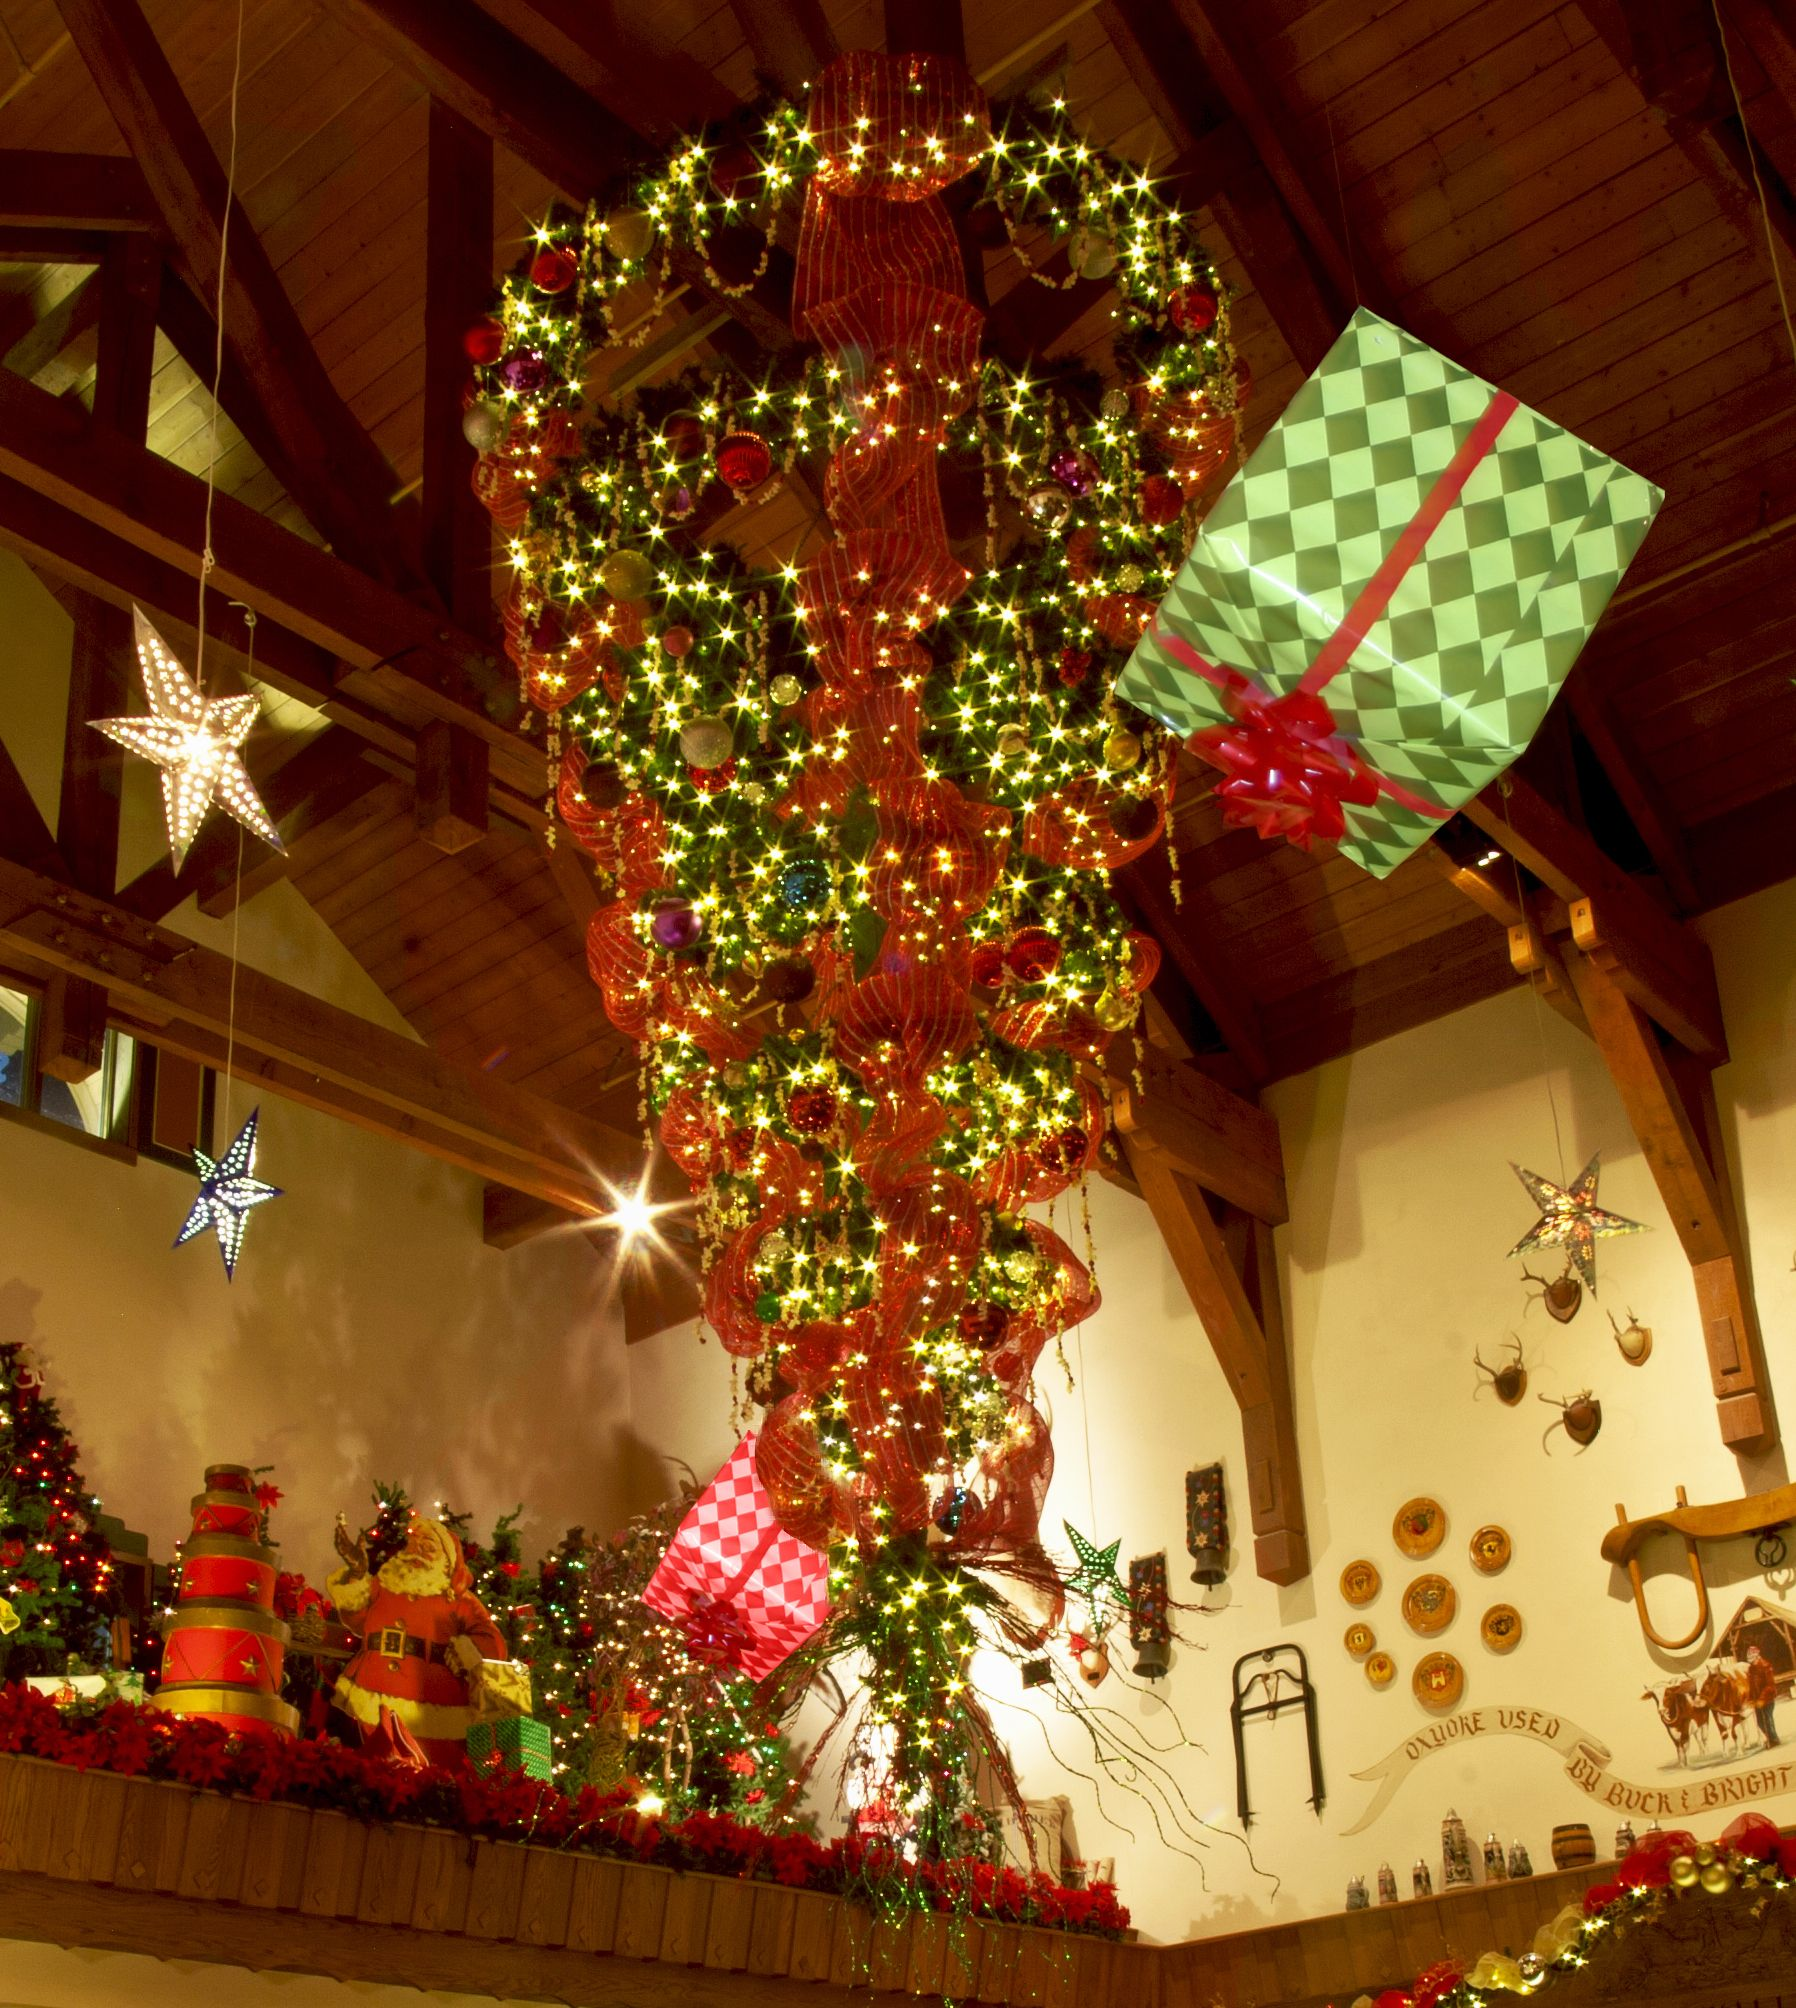 Upside Down Christmas Tree Origin.Upside Down Christmas Tree History Stand Under The Tree